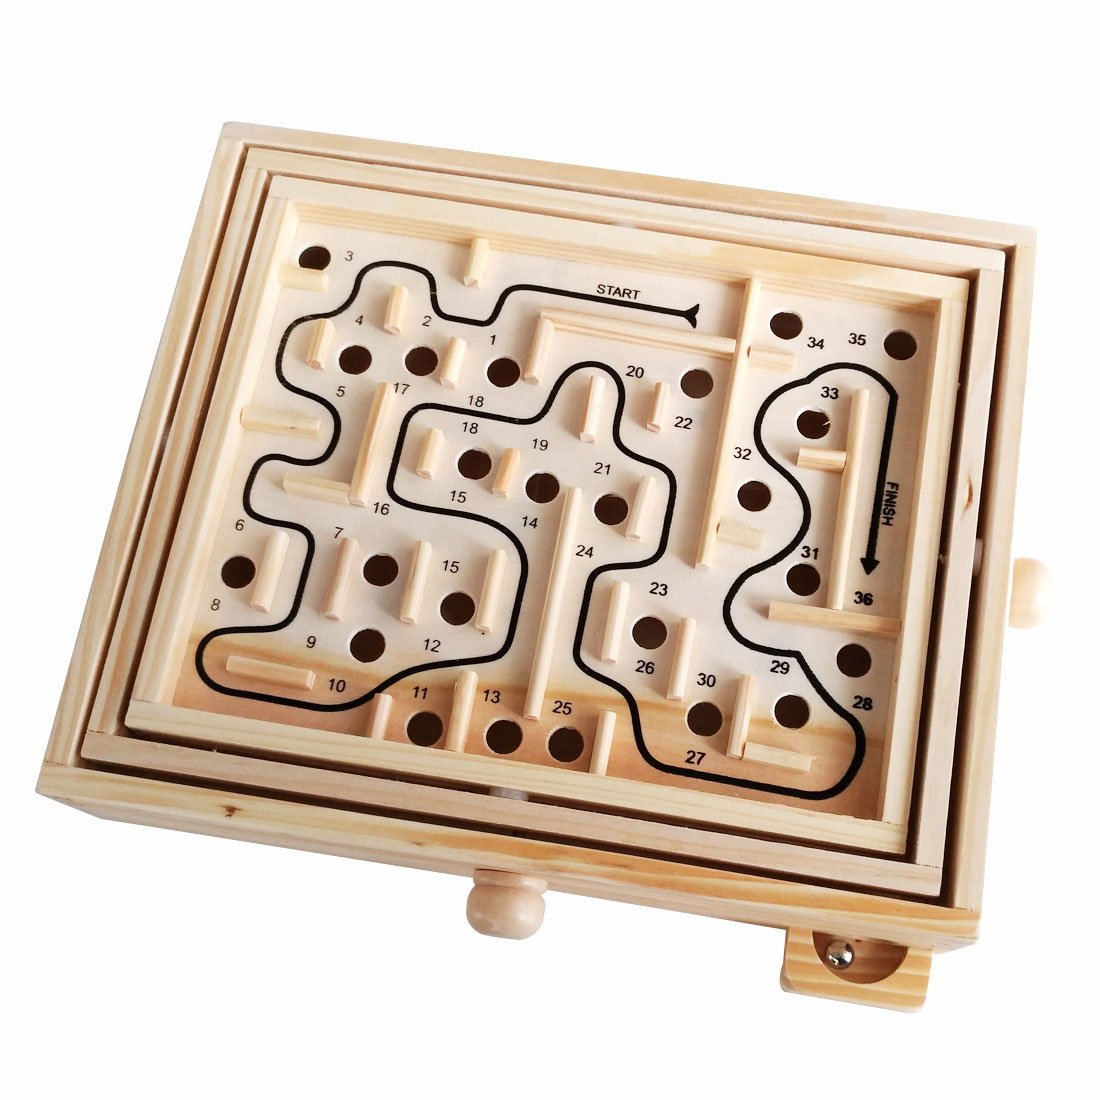 GARASANI Wood Labyrinth Game with 2 Metal Balls 36 Hole